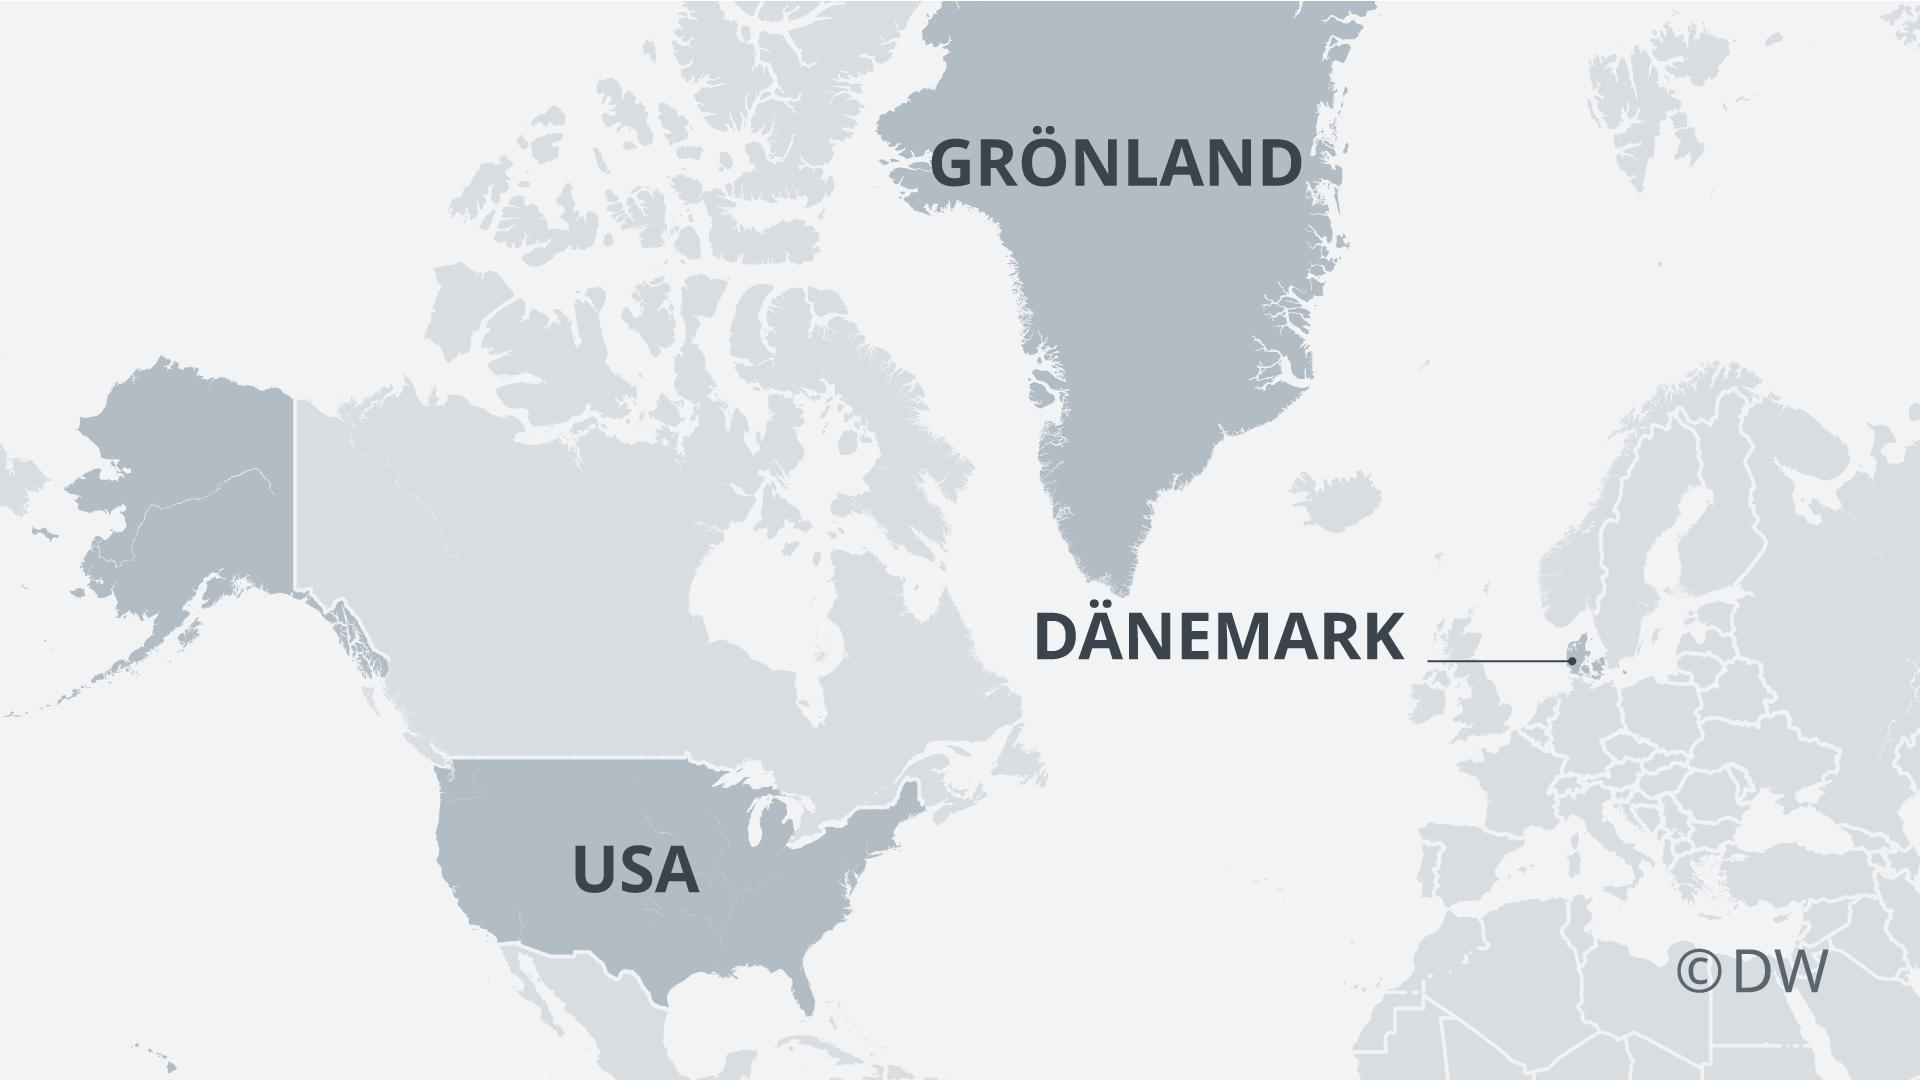 Karte USA-Grönland-Dänemank